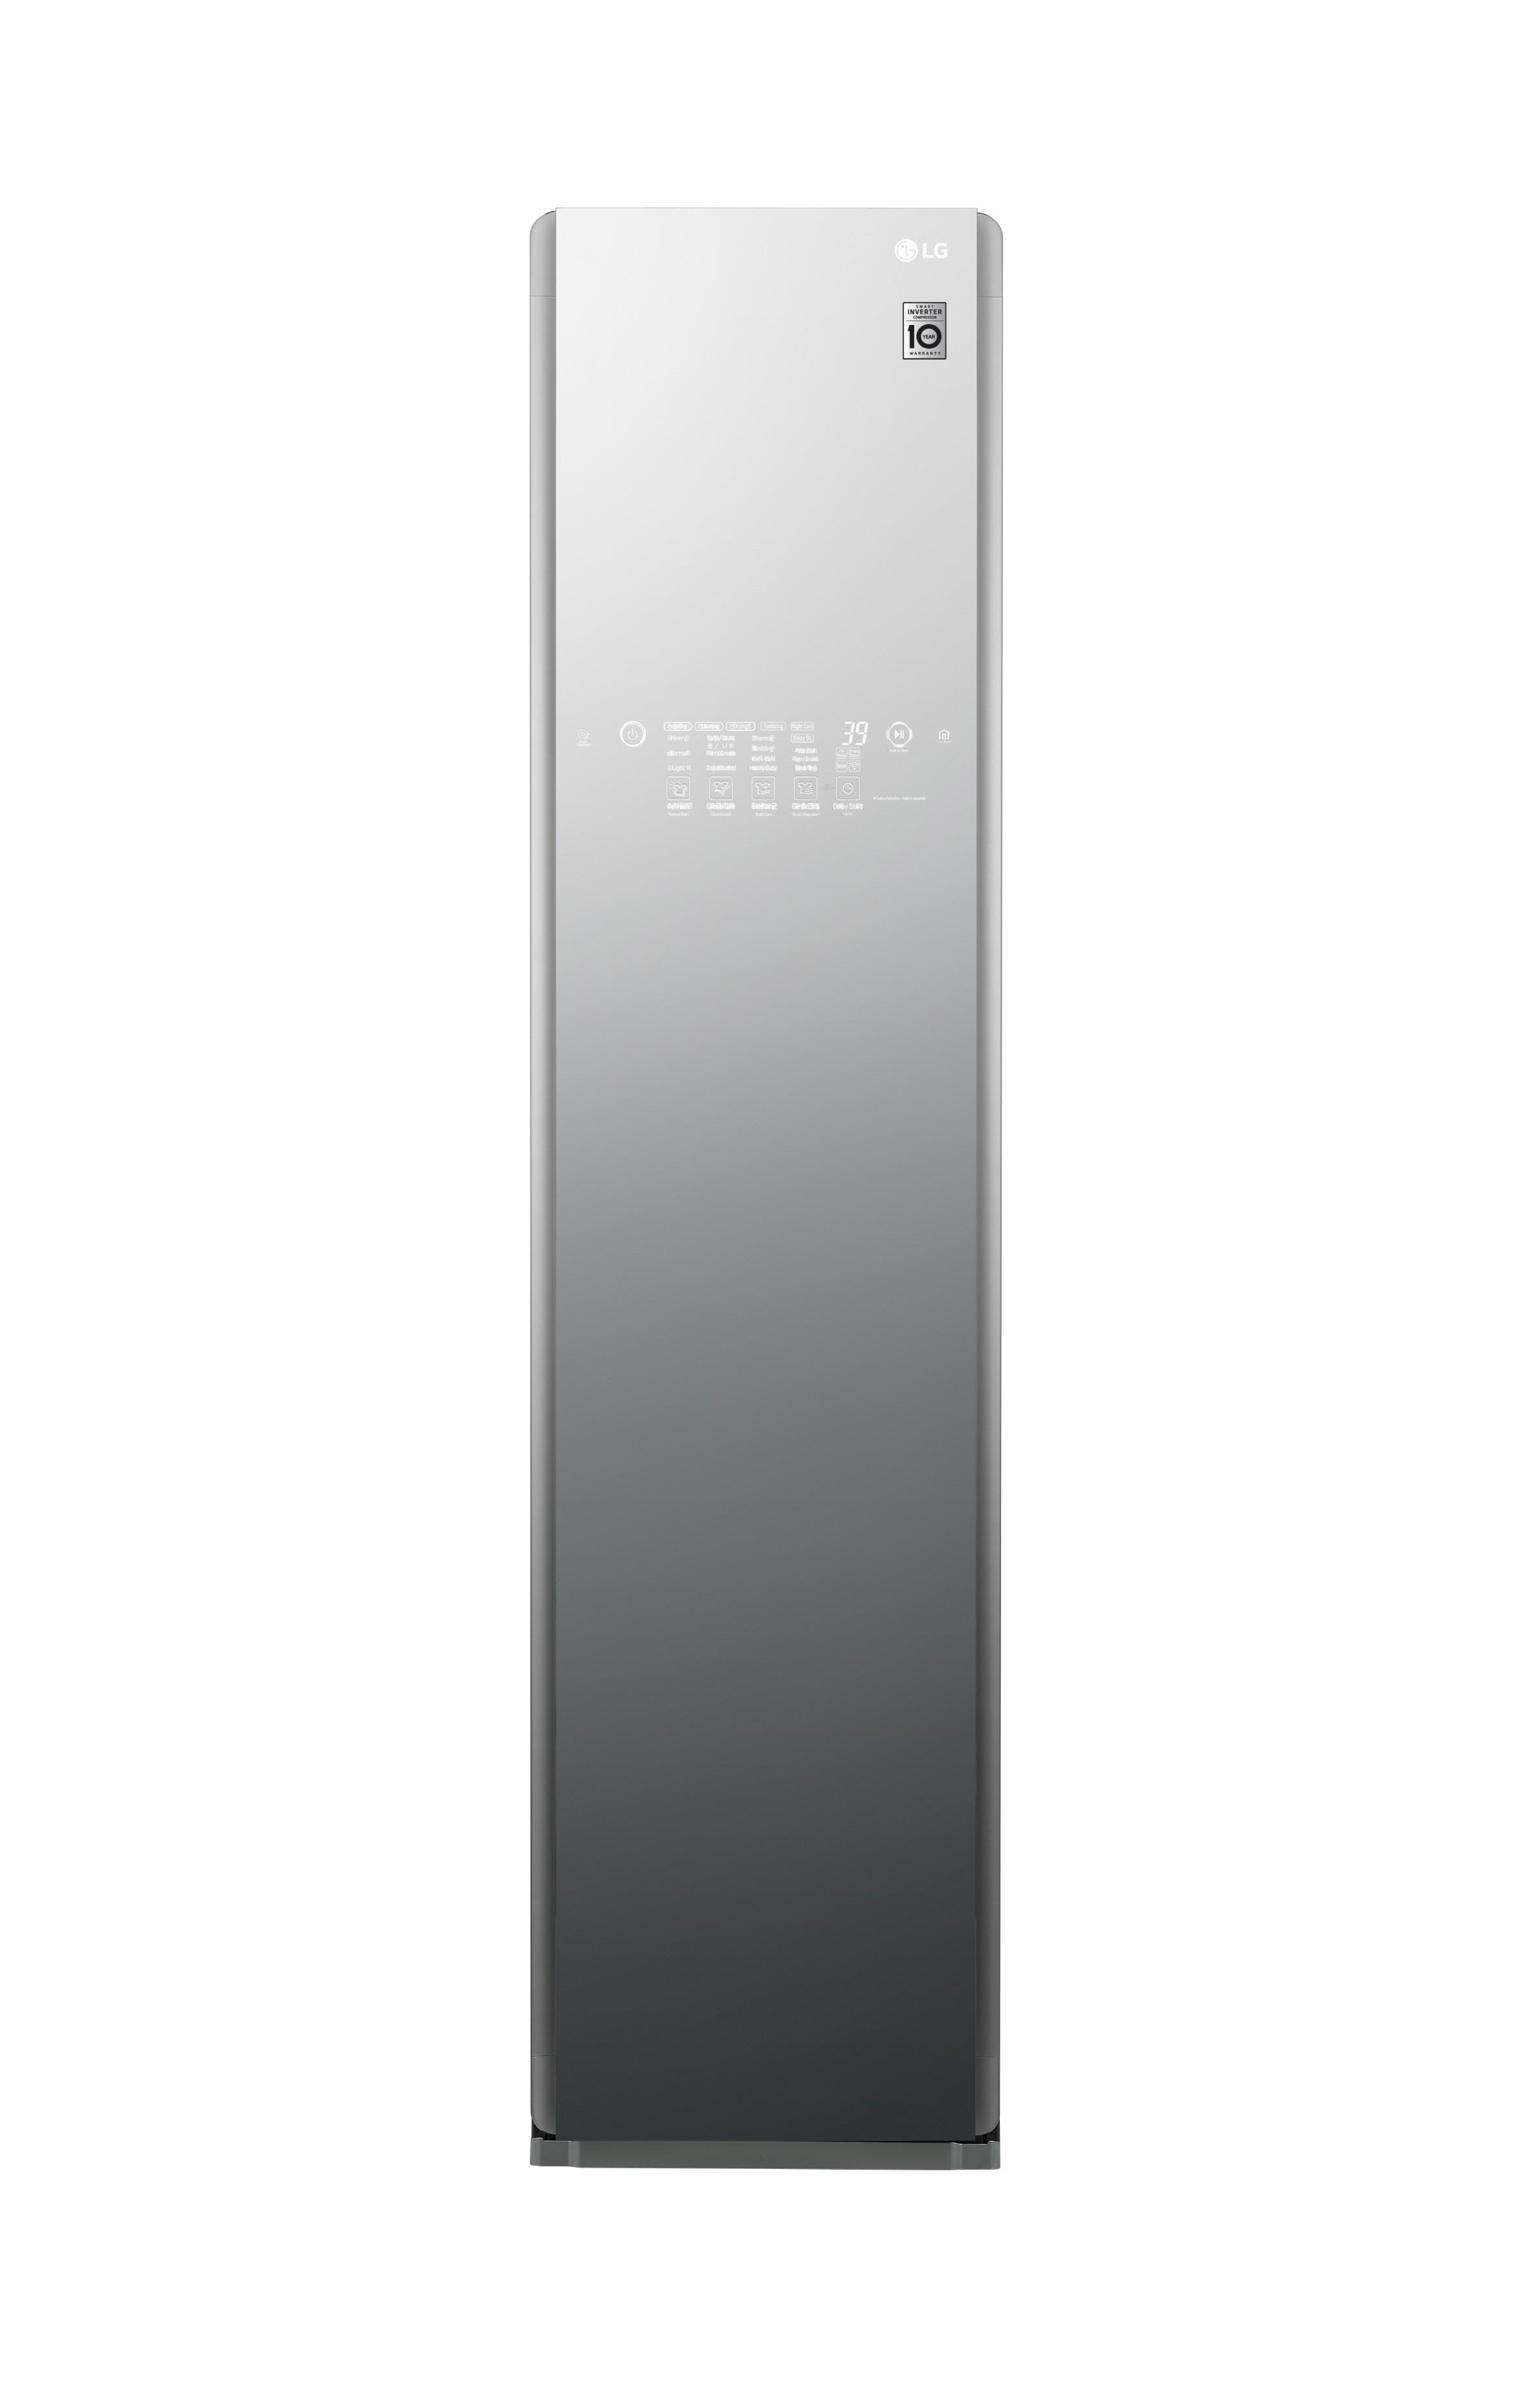 Front view of LG Styler Black Tinted Mirror Glass Door with 3 hangers